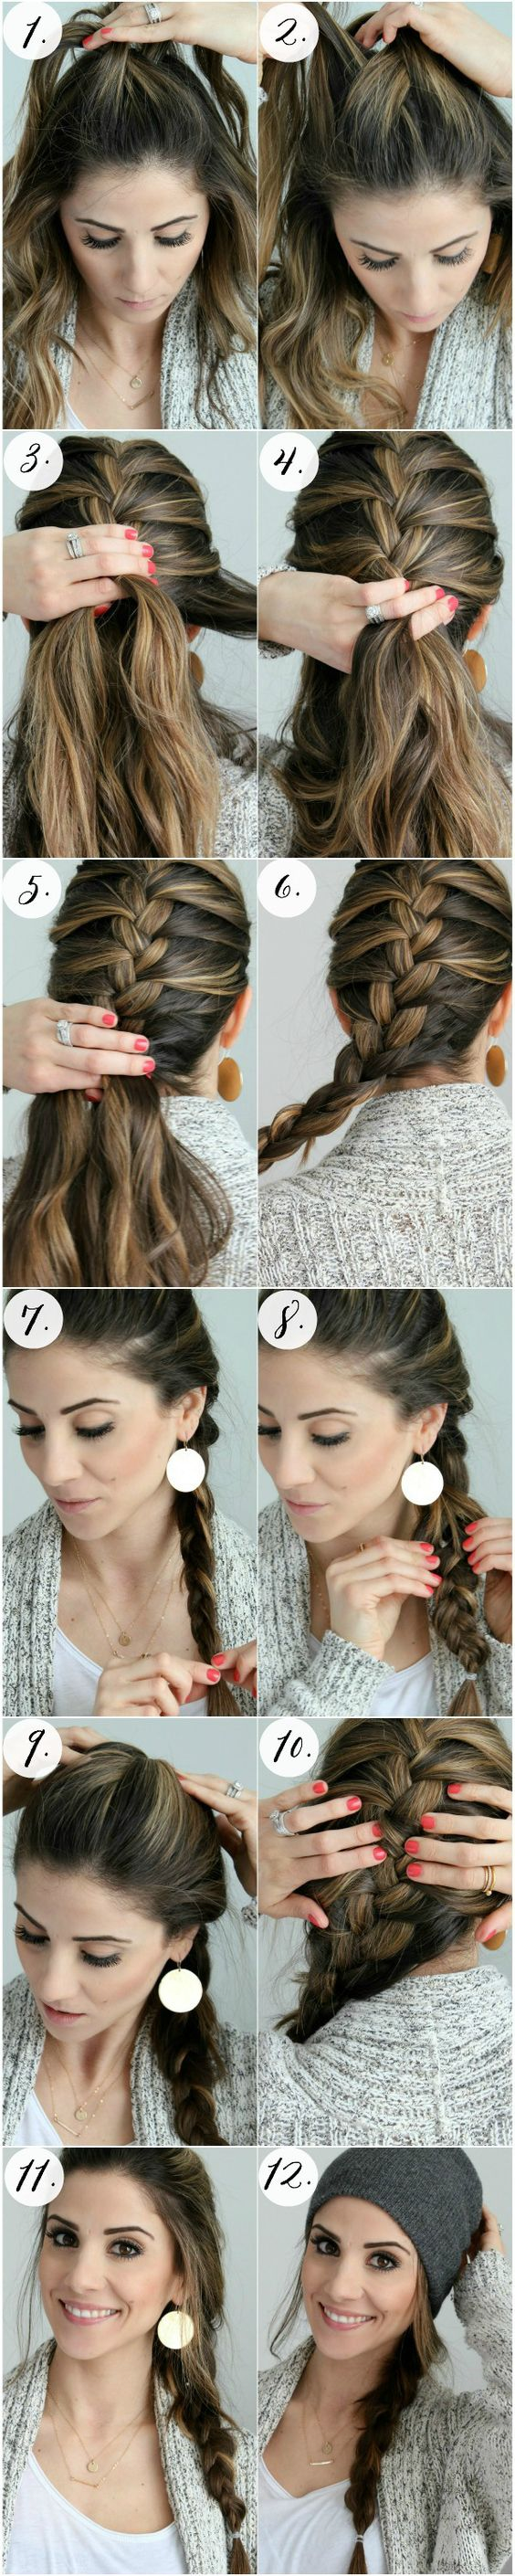 19 Easy Hair Tutorials for Summer 2017 - Pretty Designs